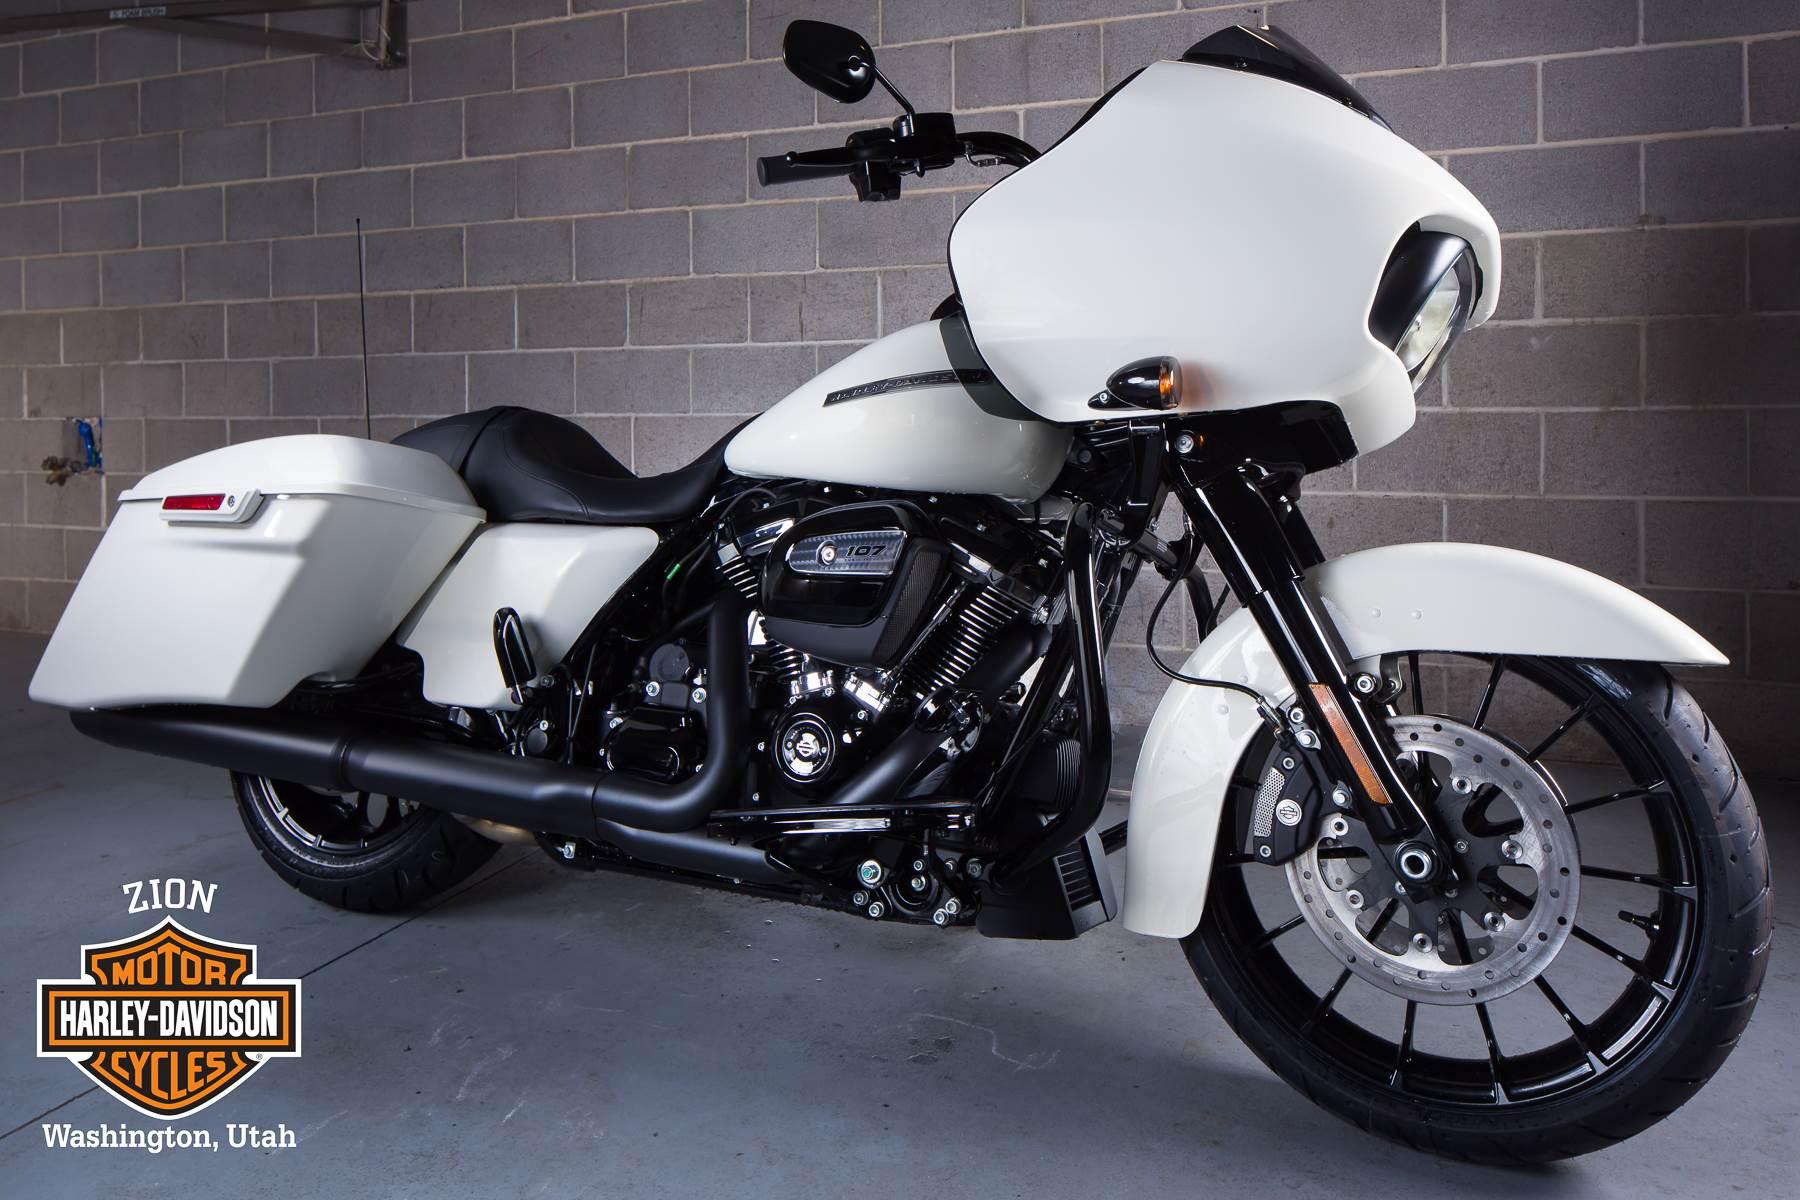 2018 Harley-Davidson Road Glide Special 2